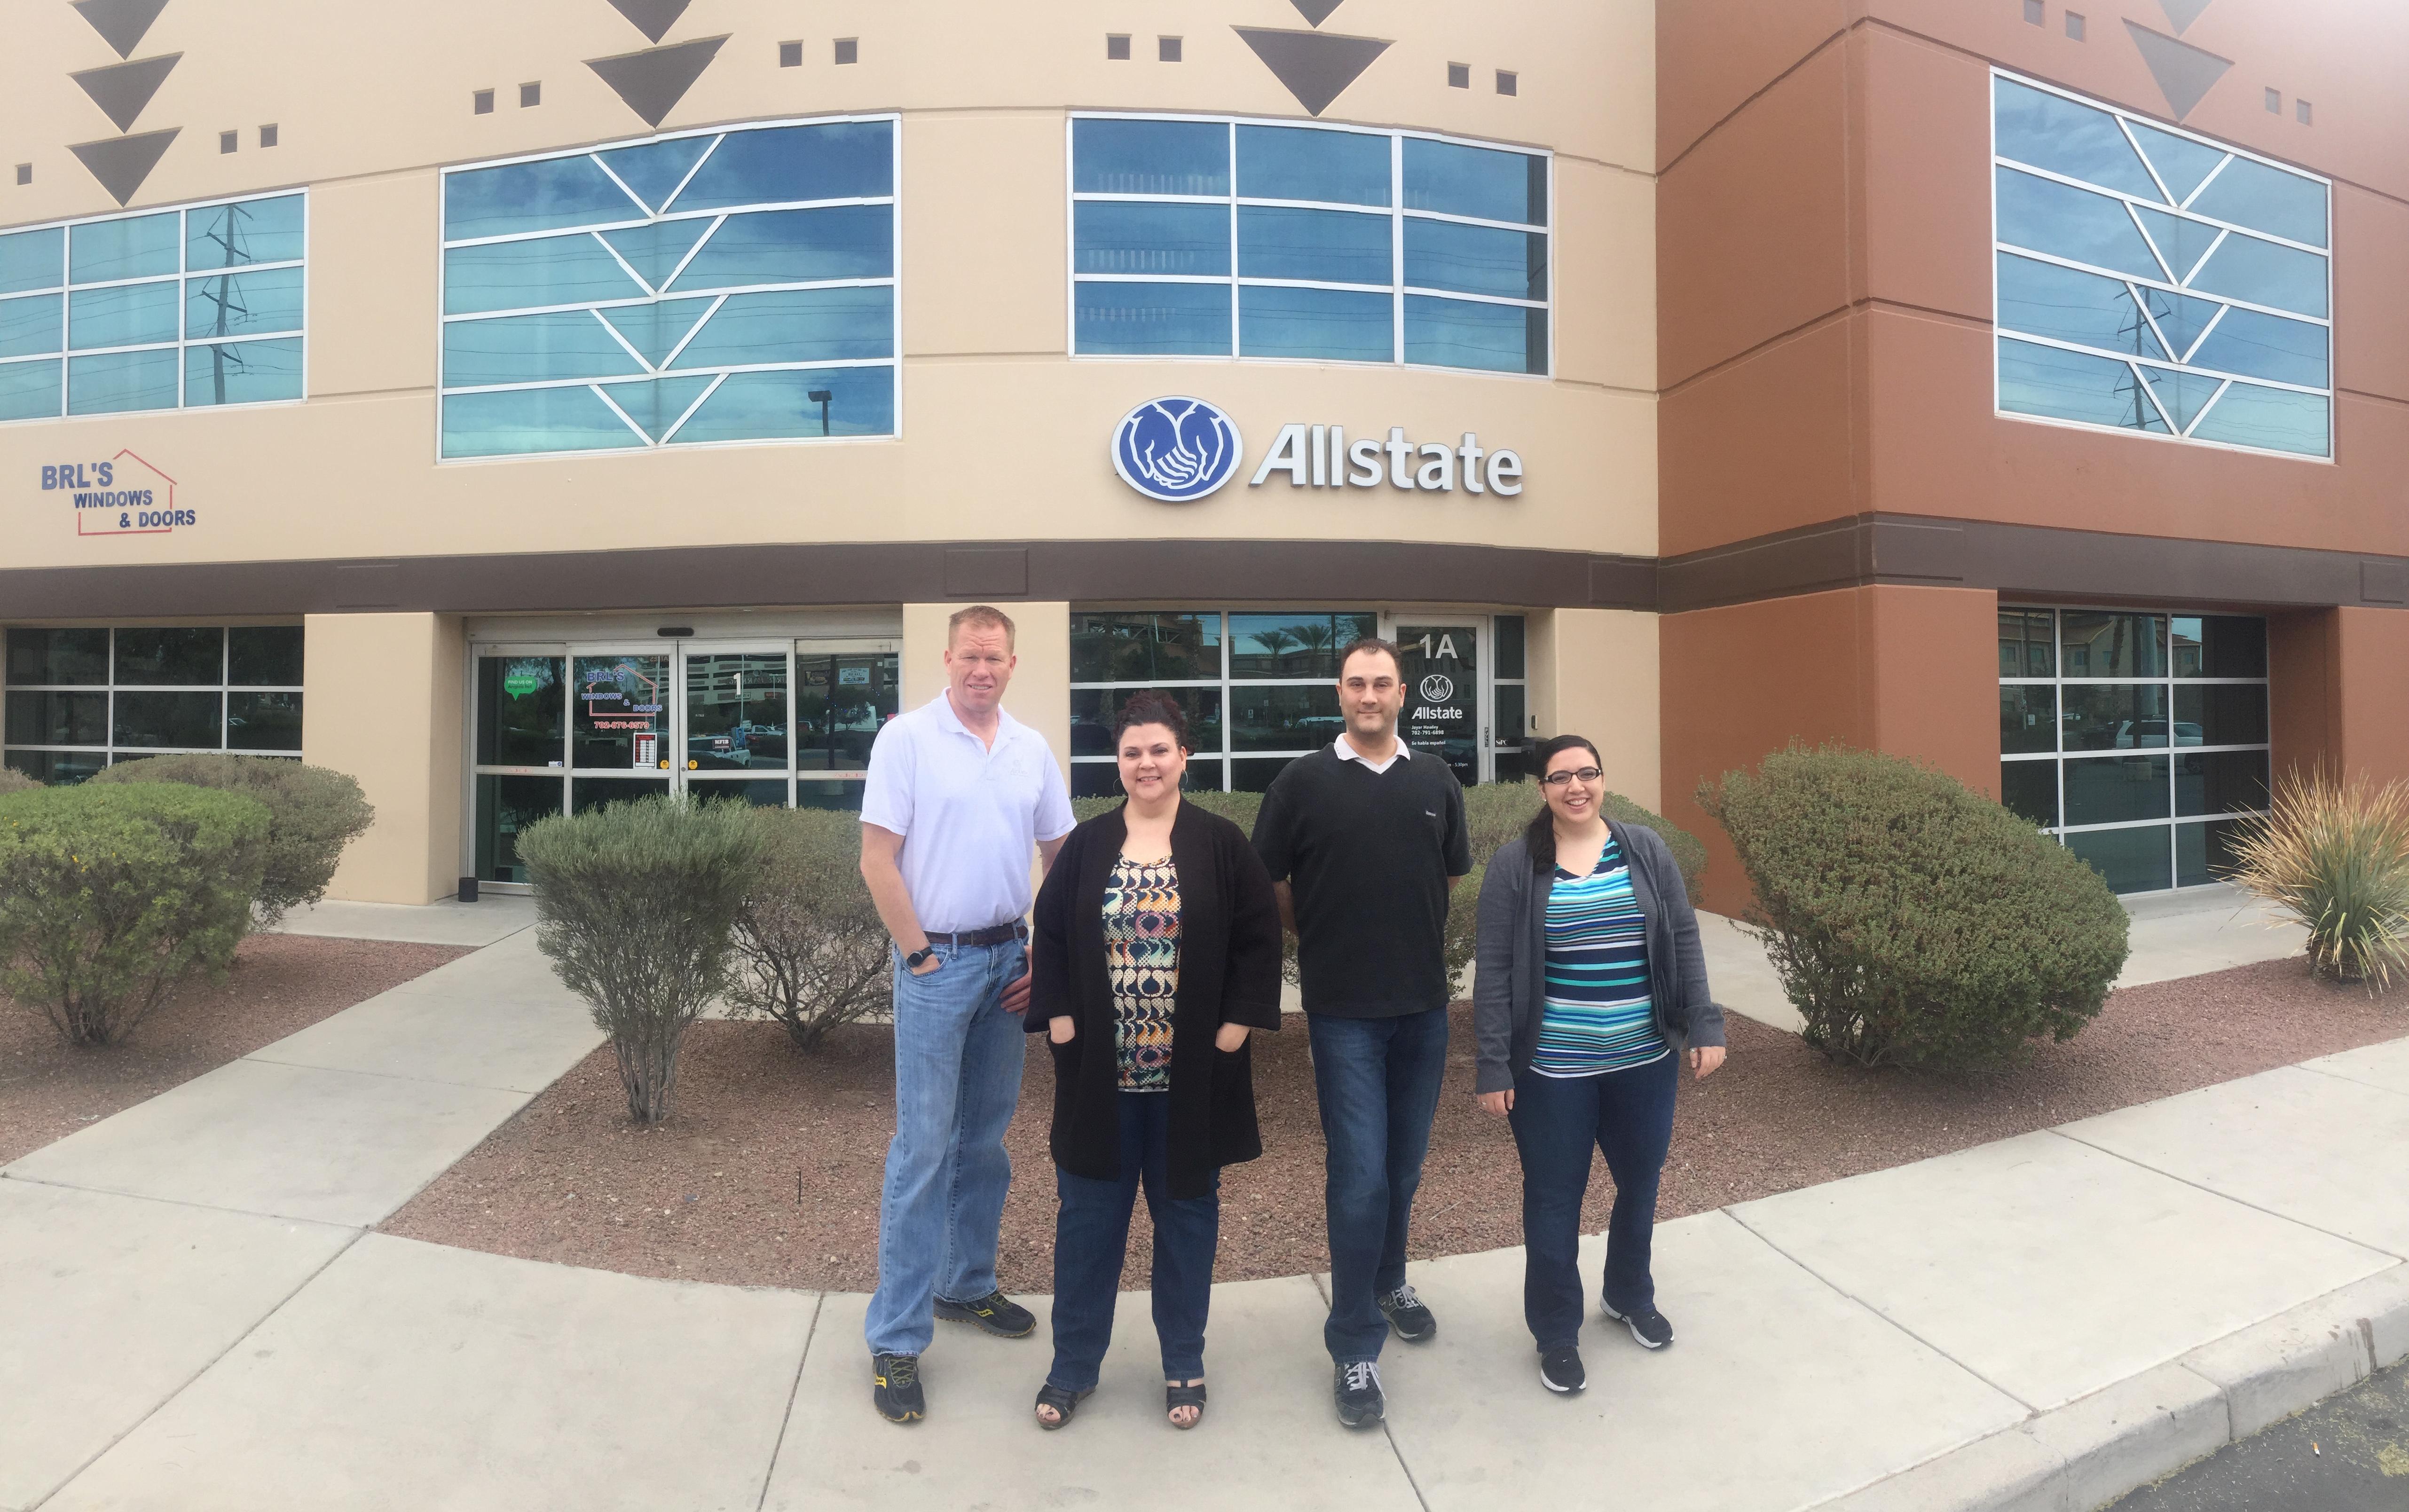 Jayar Hawley: Allstate Insurance image 6